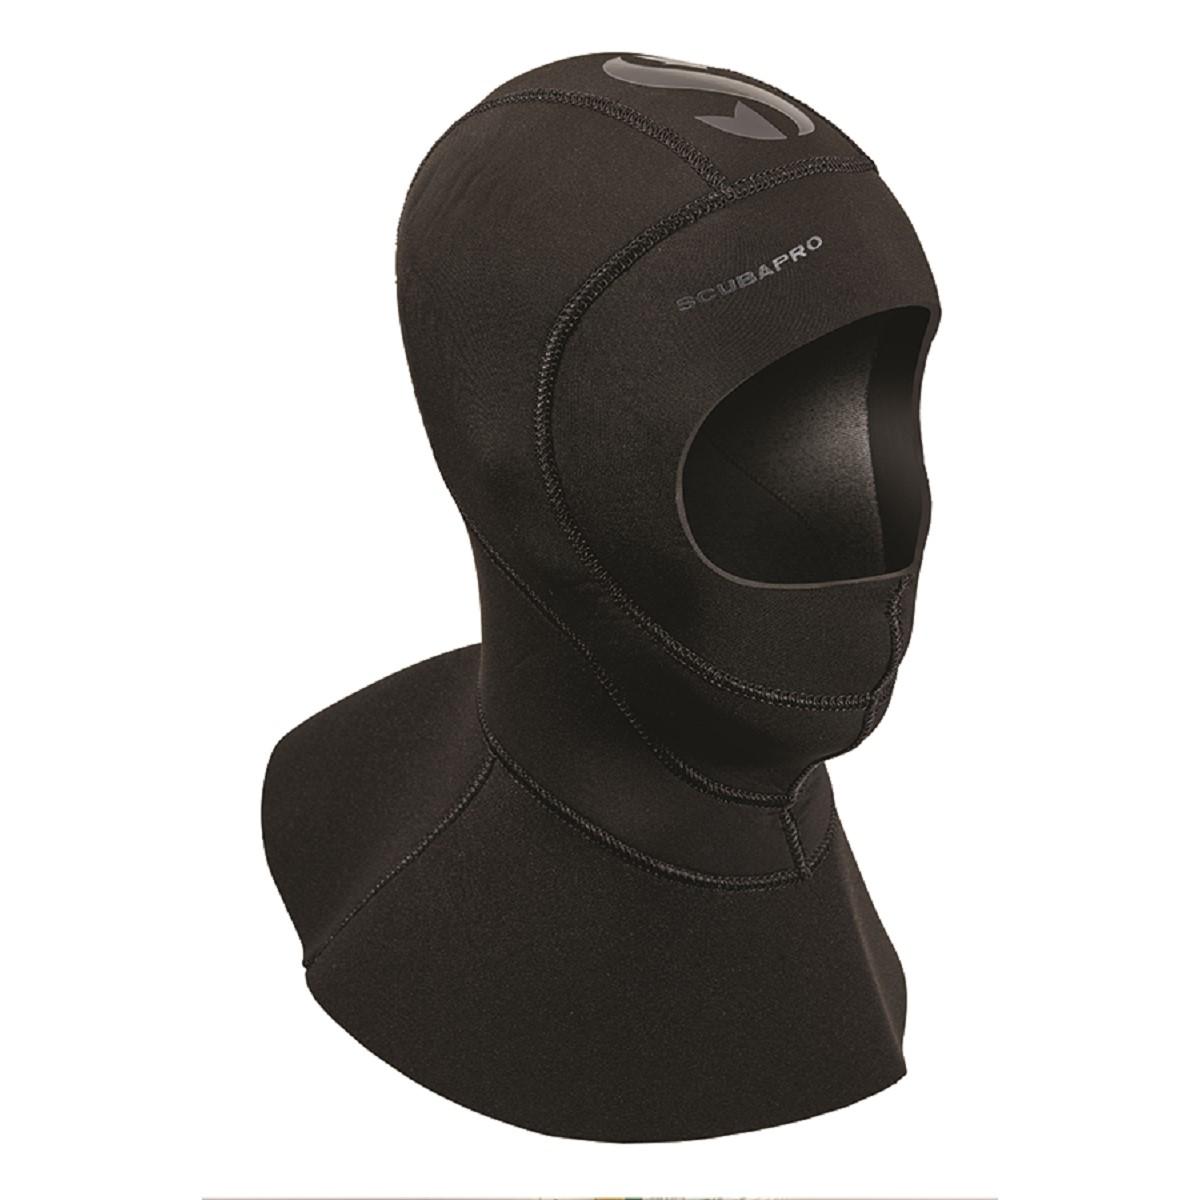 SCUBAPRO - Everflex 3.0 Kopfhaube 6/5/4mm mit Kragen